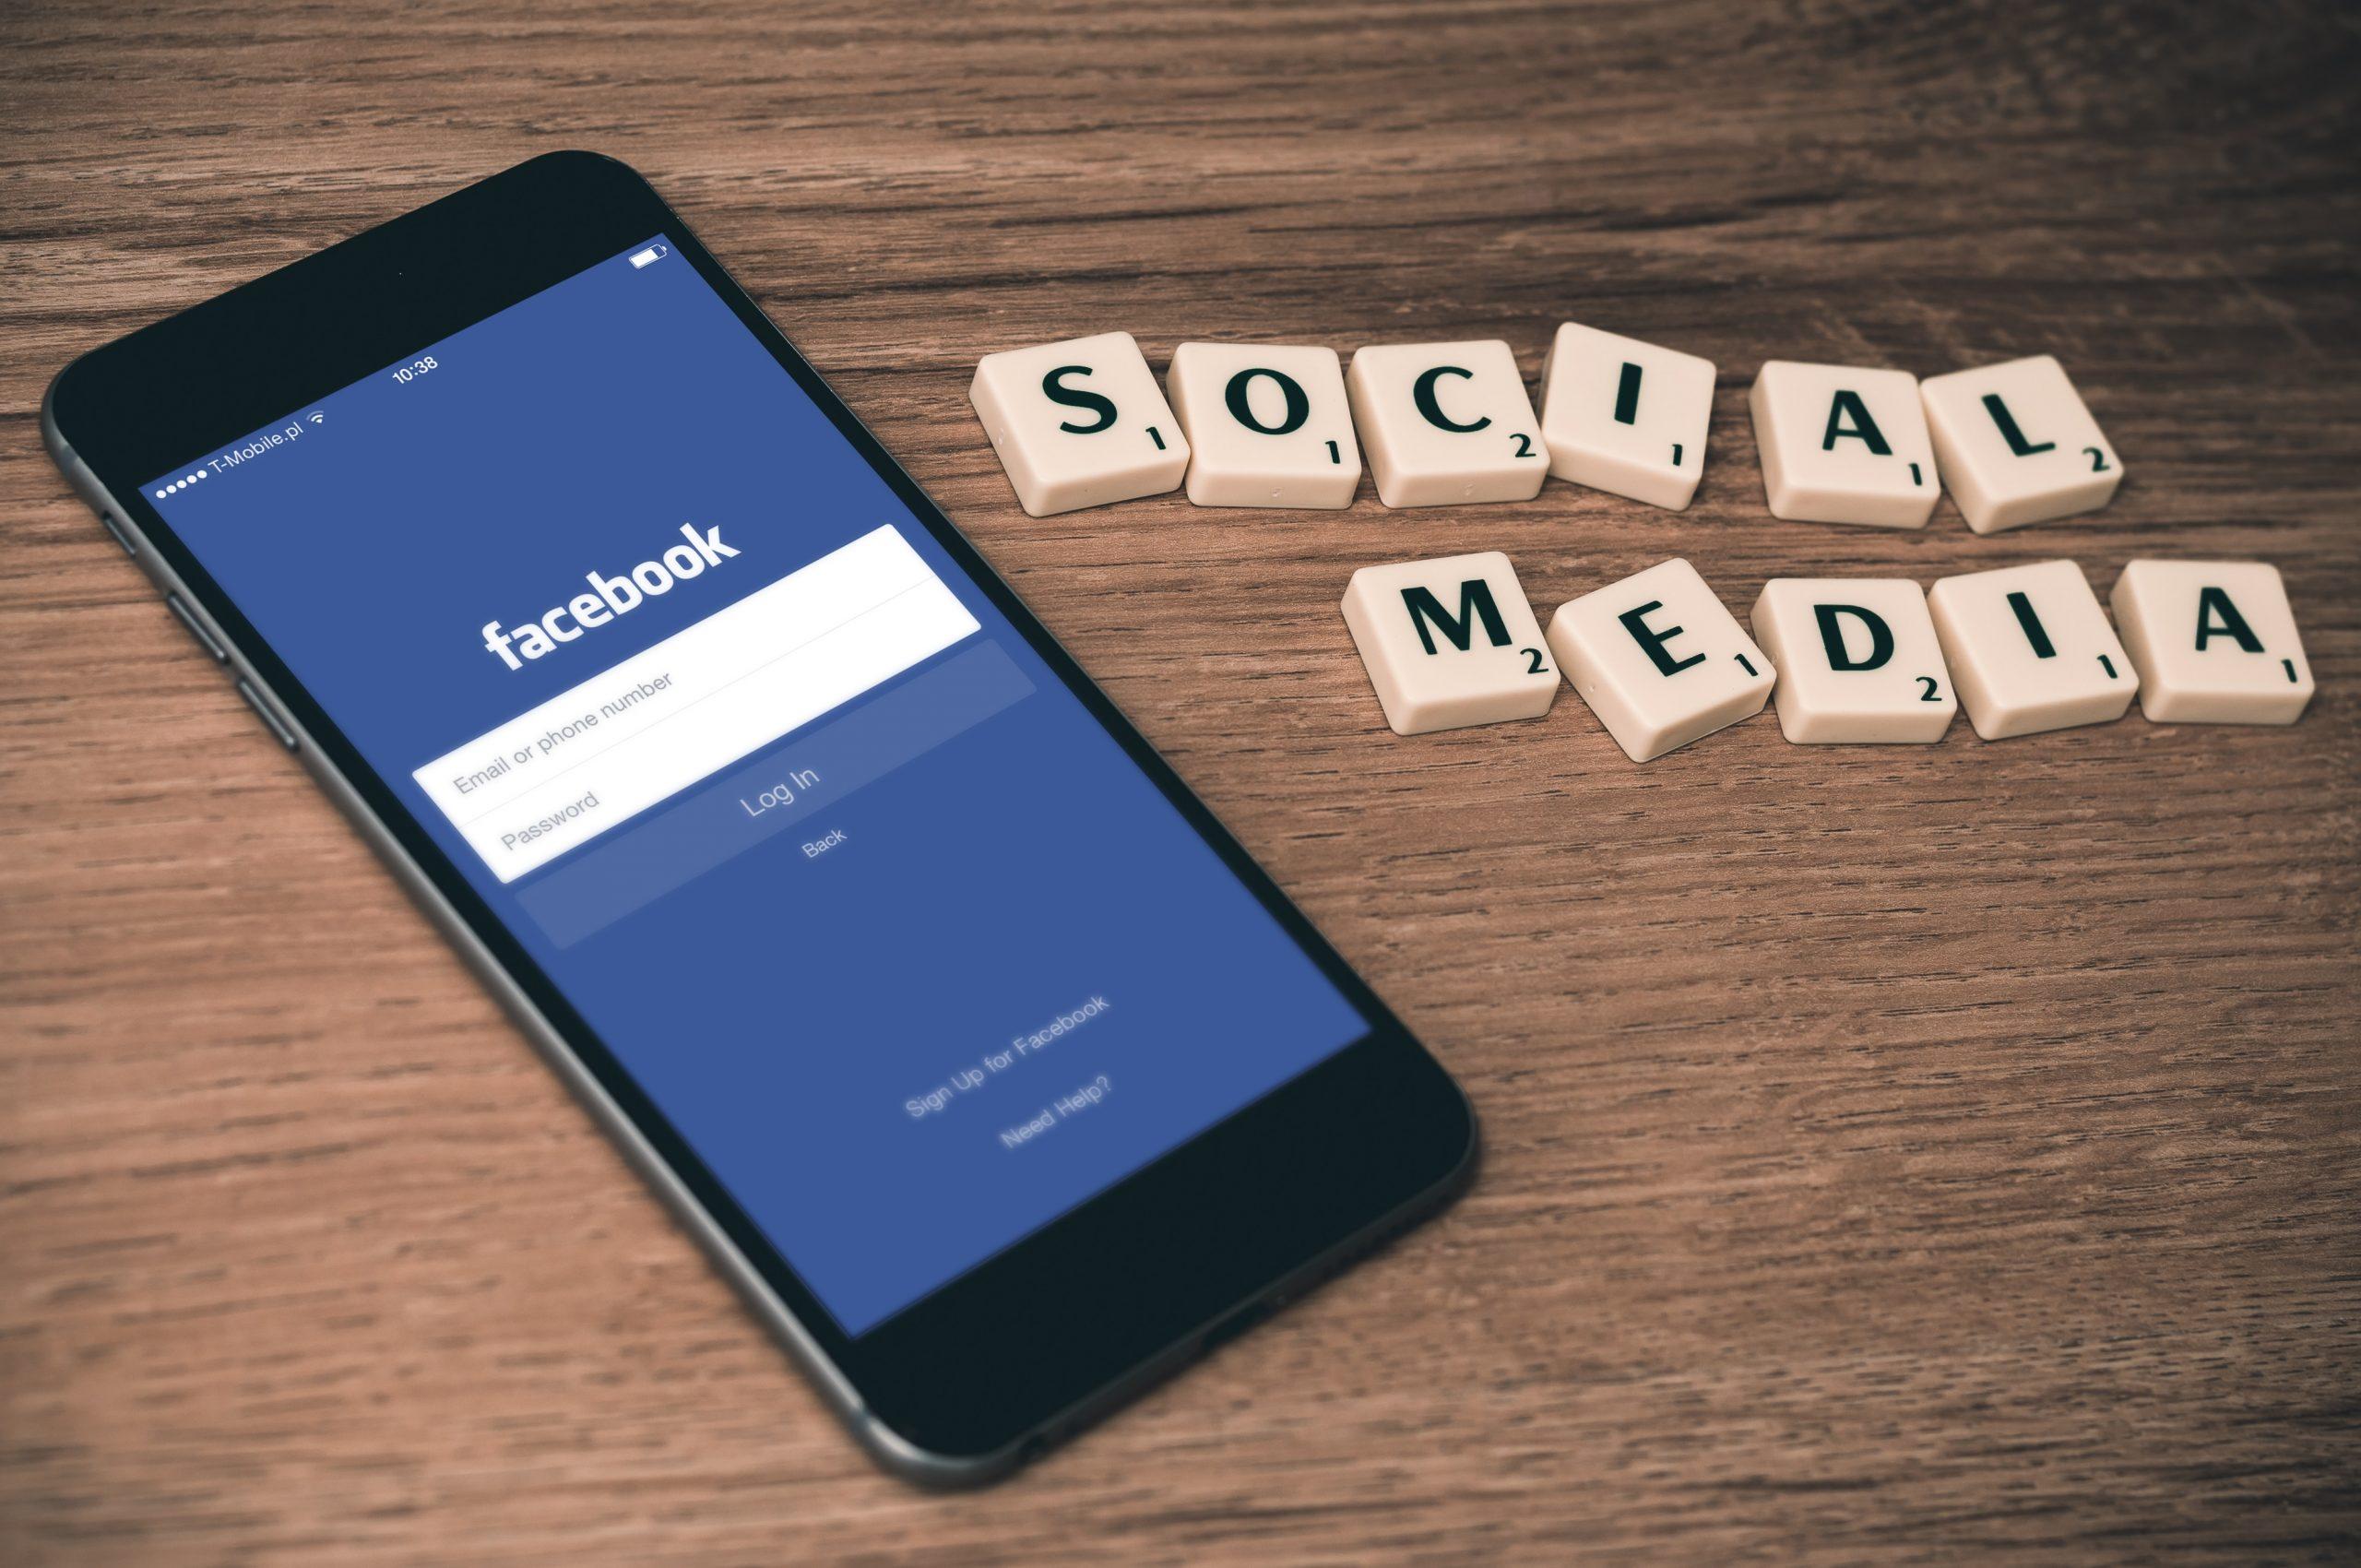 5 Tips to Improve Your Social Media Presence